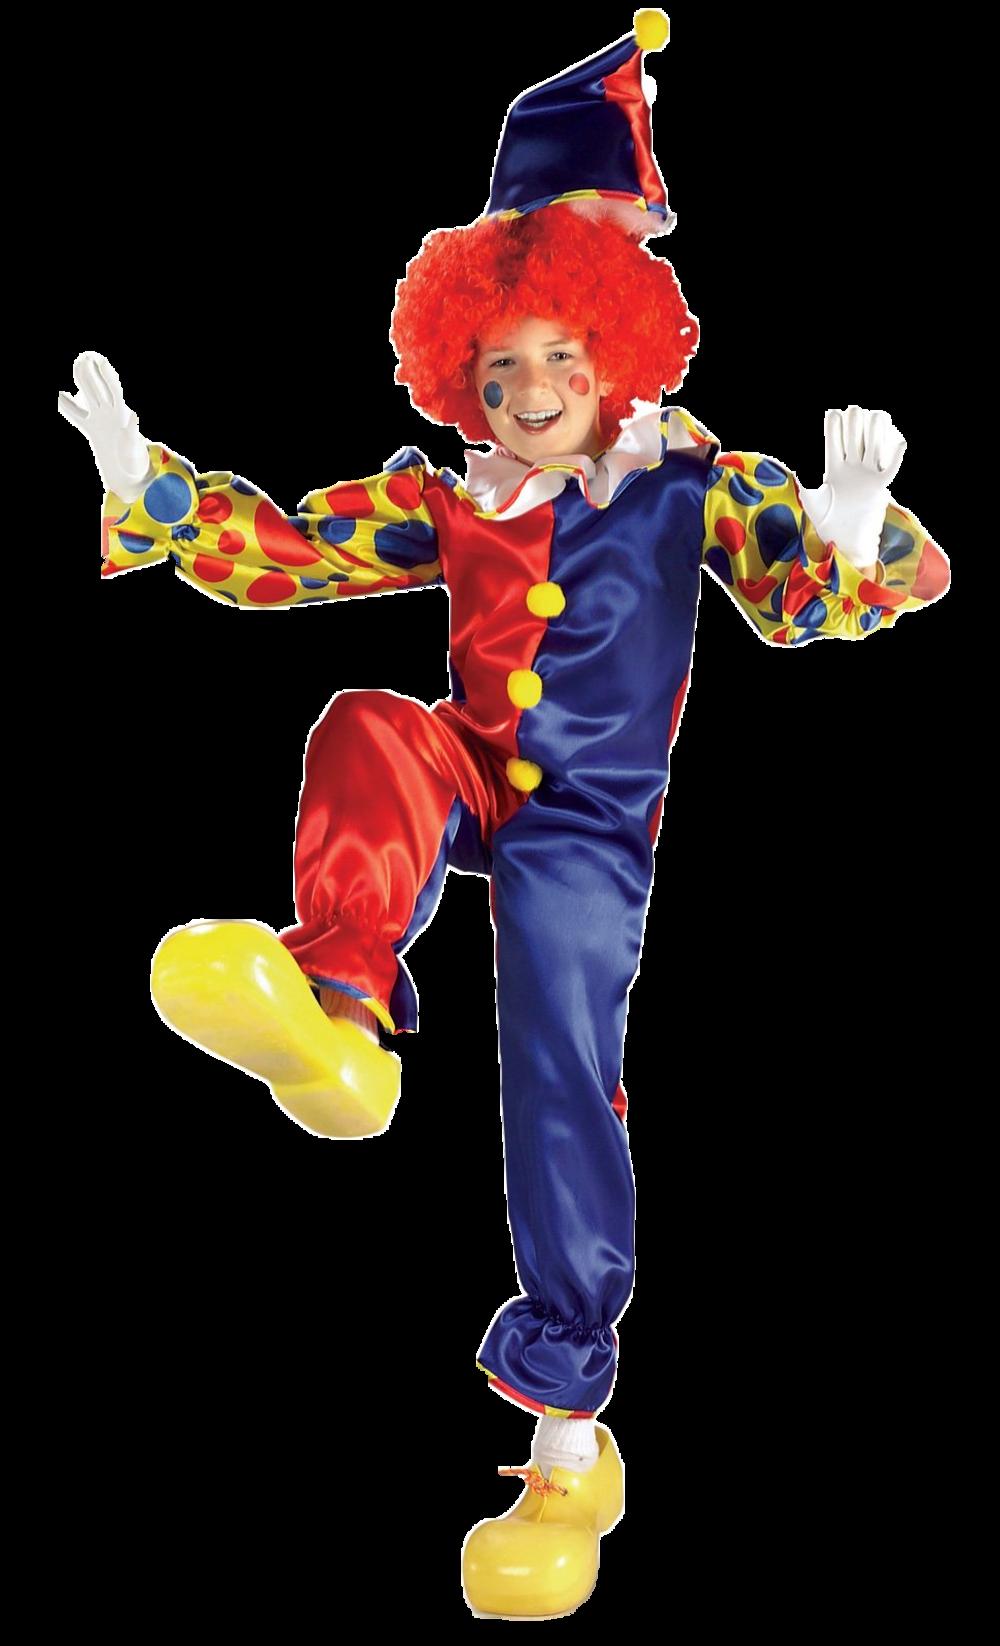 Bubbles the Clown Boys Fancy Dress Childrens Kids Costume + Hat Ages 3-10 - New